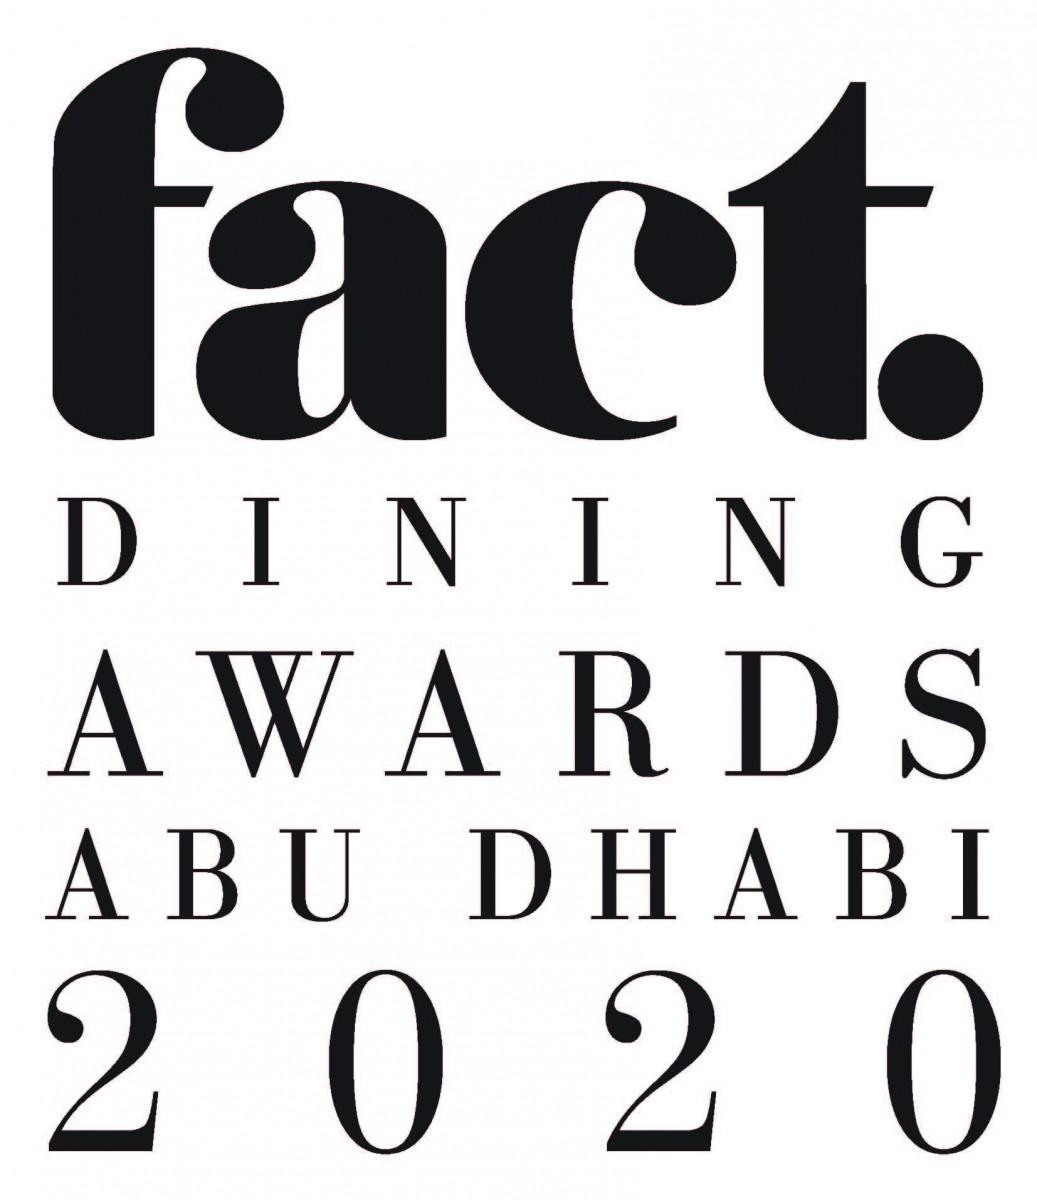 Fact Dining Awards Abu Dhabi 2020